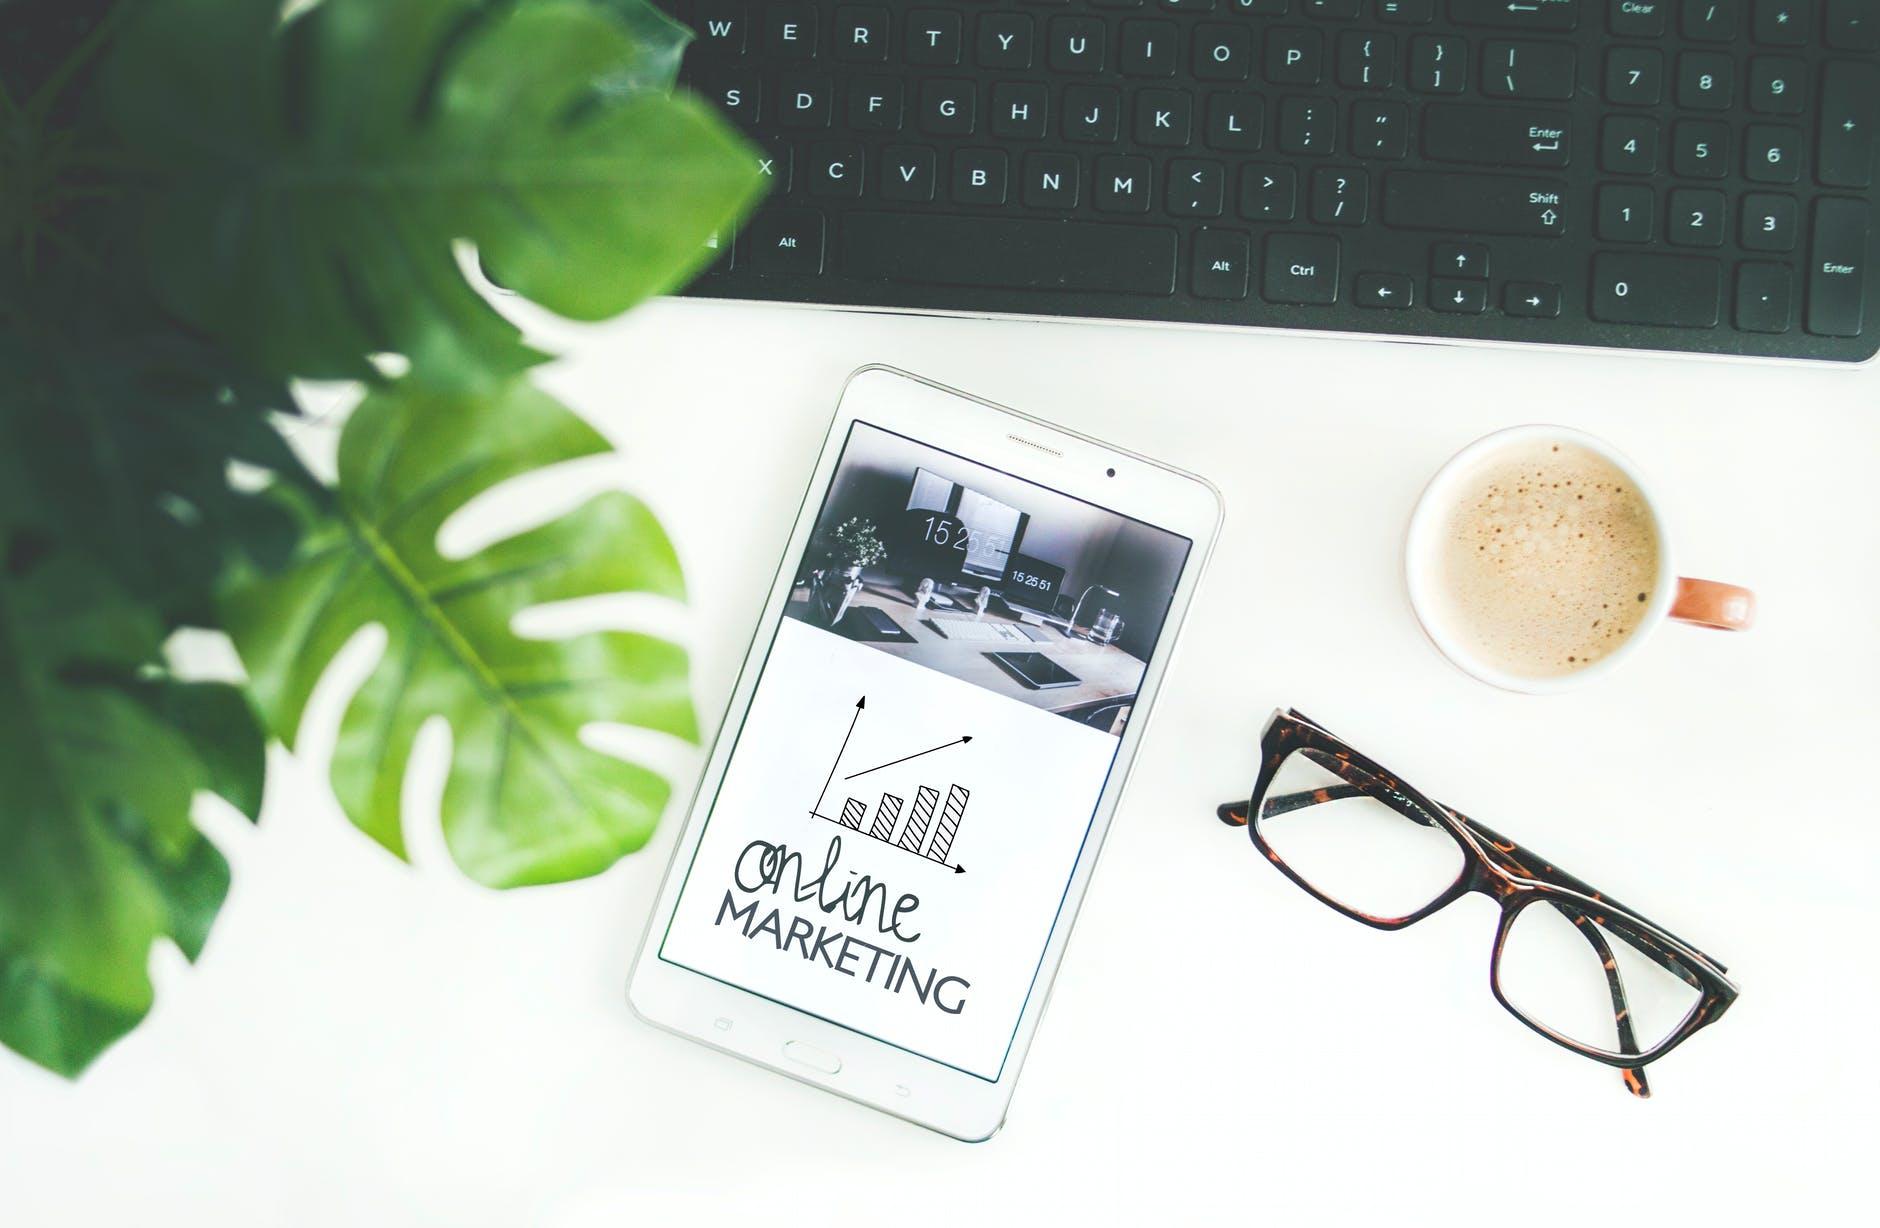 Social Media Marketing services near London, UK